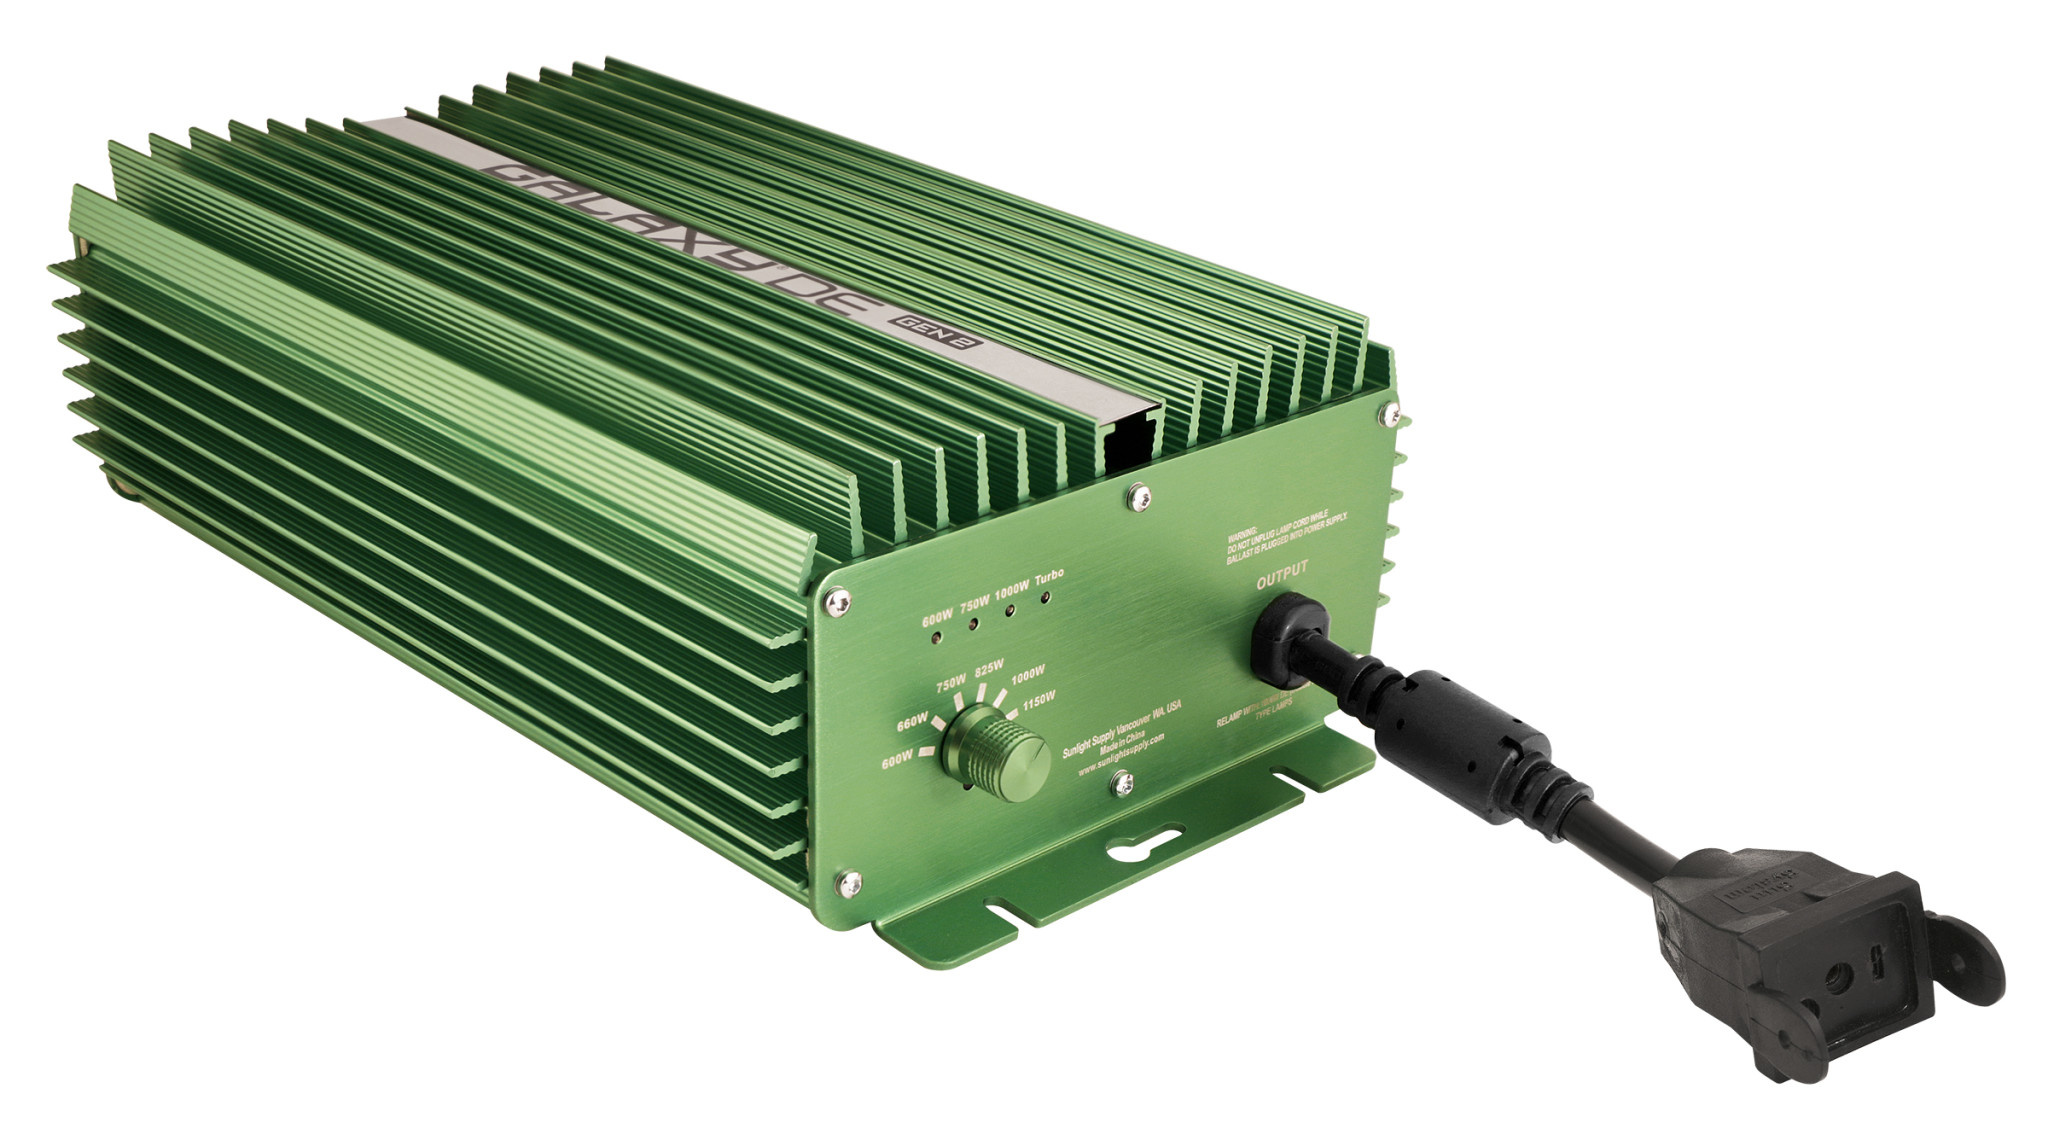 Galaxy - Gen 2 Remote Ballast 120/240v CMH